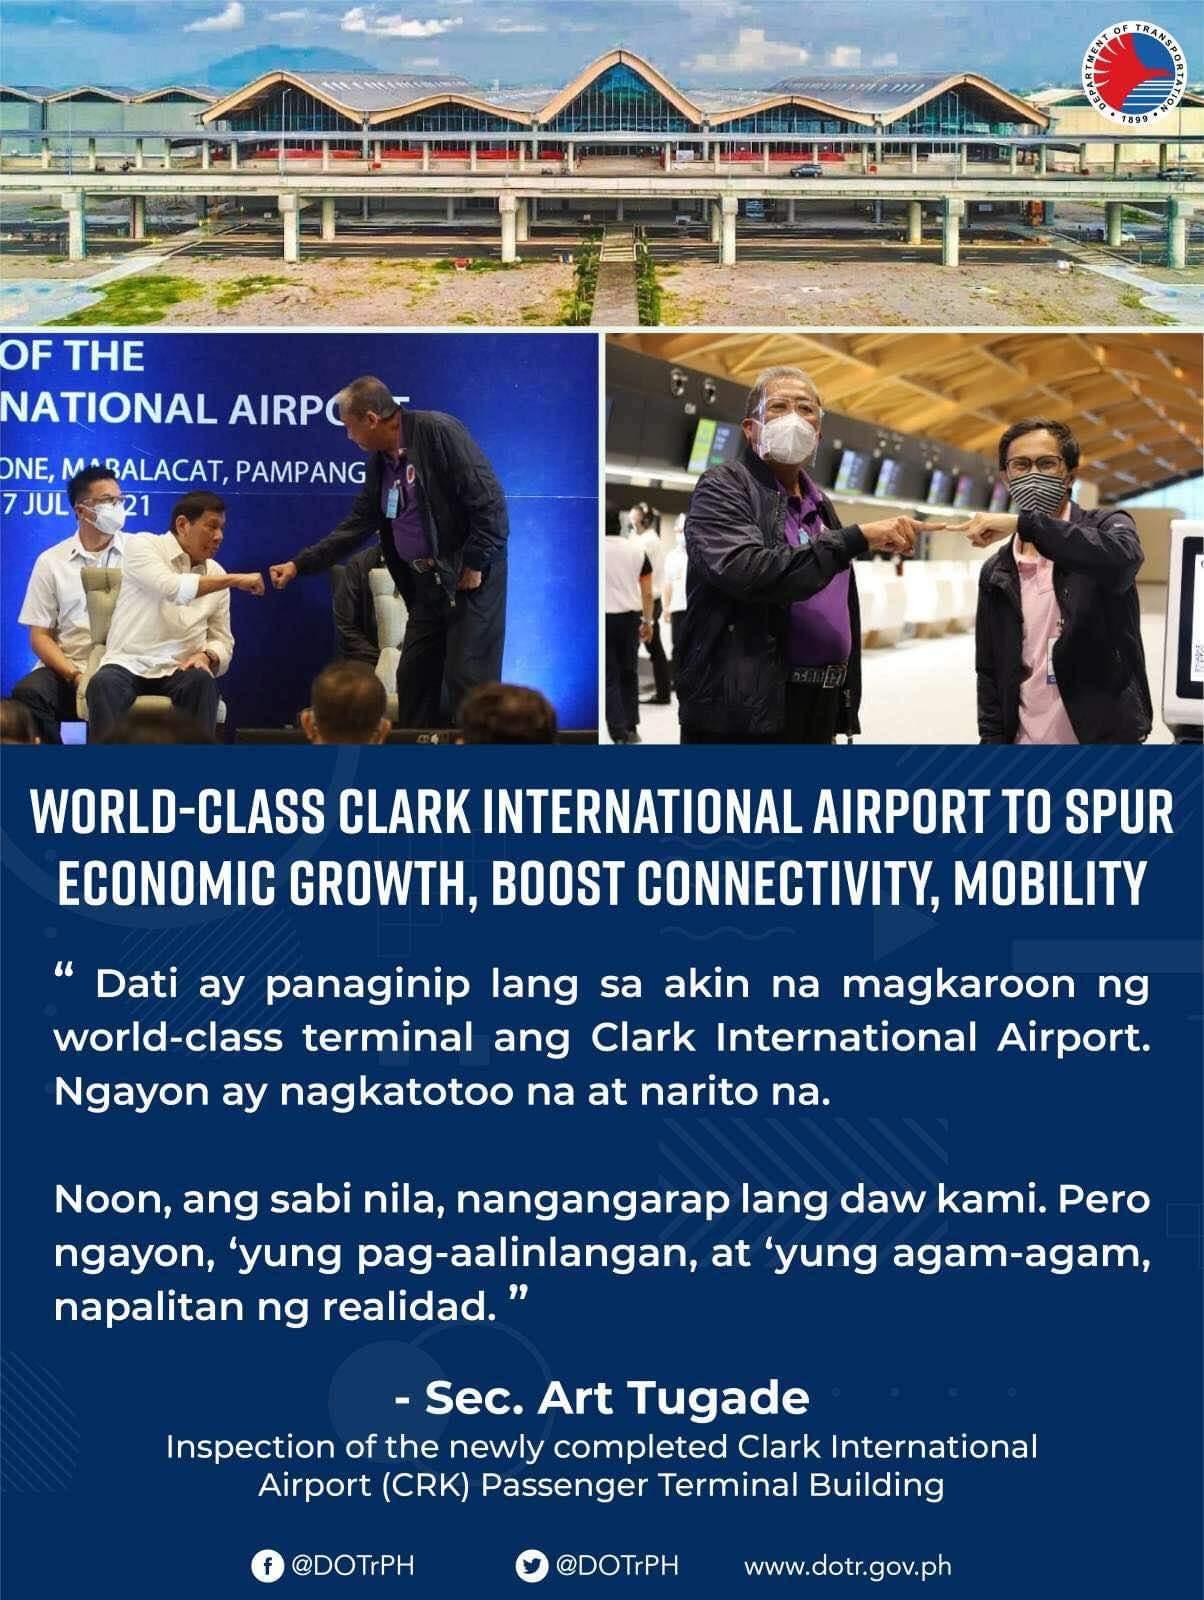 Clark International Airport, a realized dream